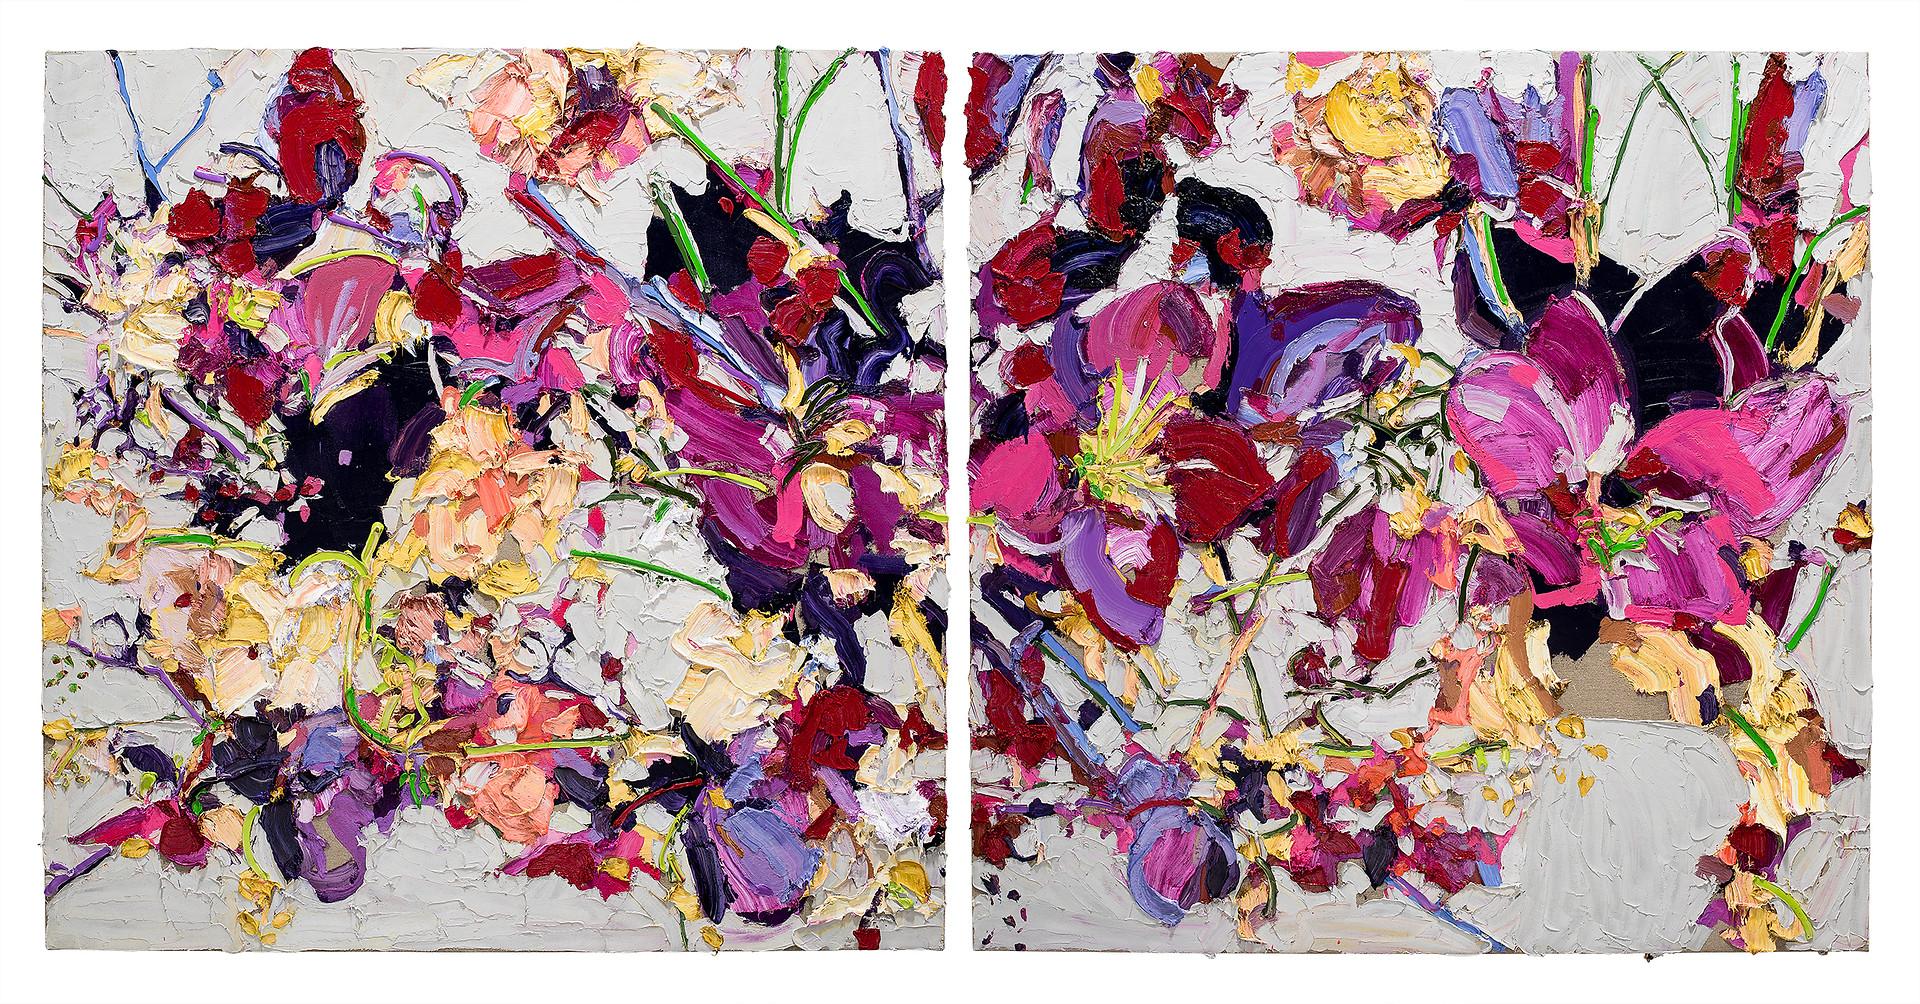 Alesandro Ljubicic Cyclamen Cherron Rose, 2017 Oil on linen on DiBond, iptych 150 x 300 cm